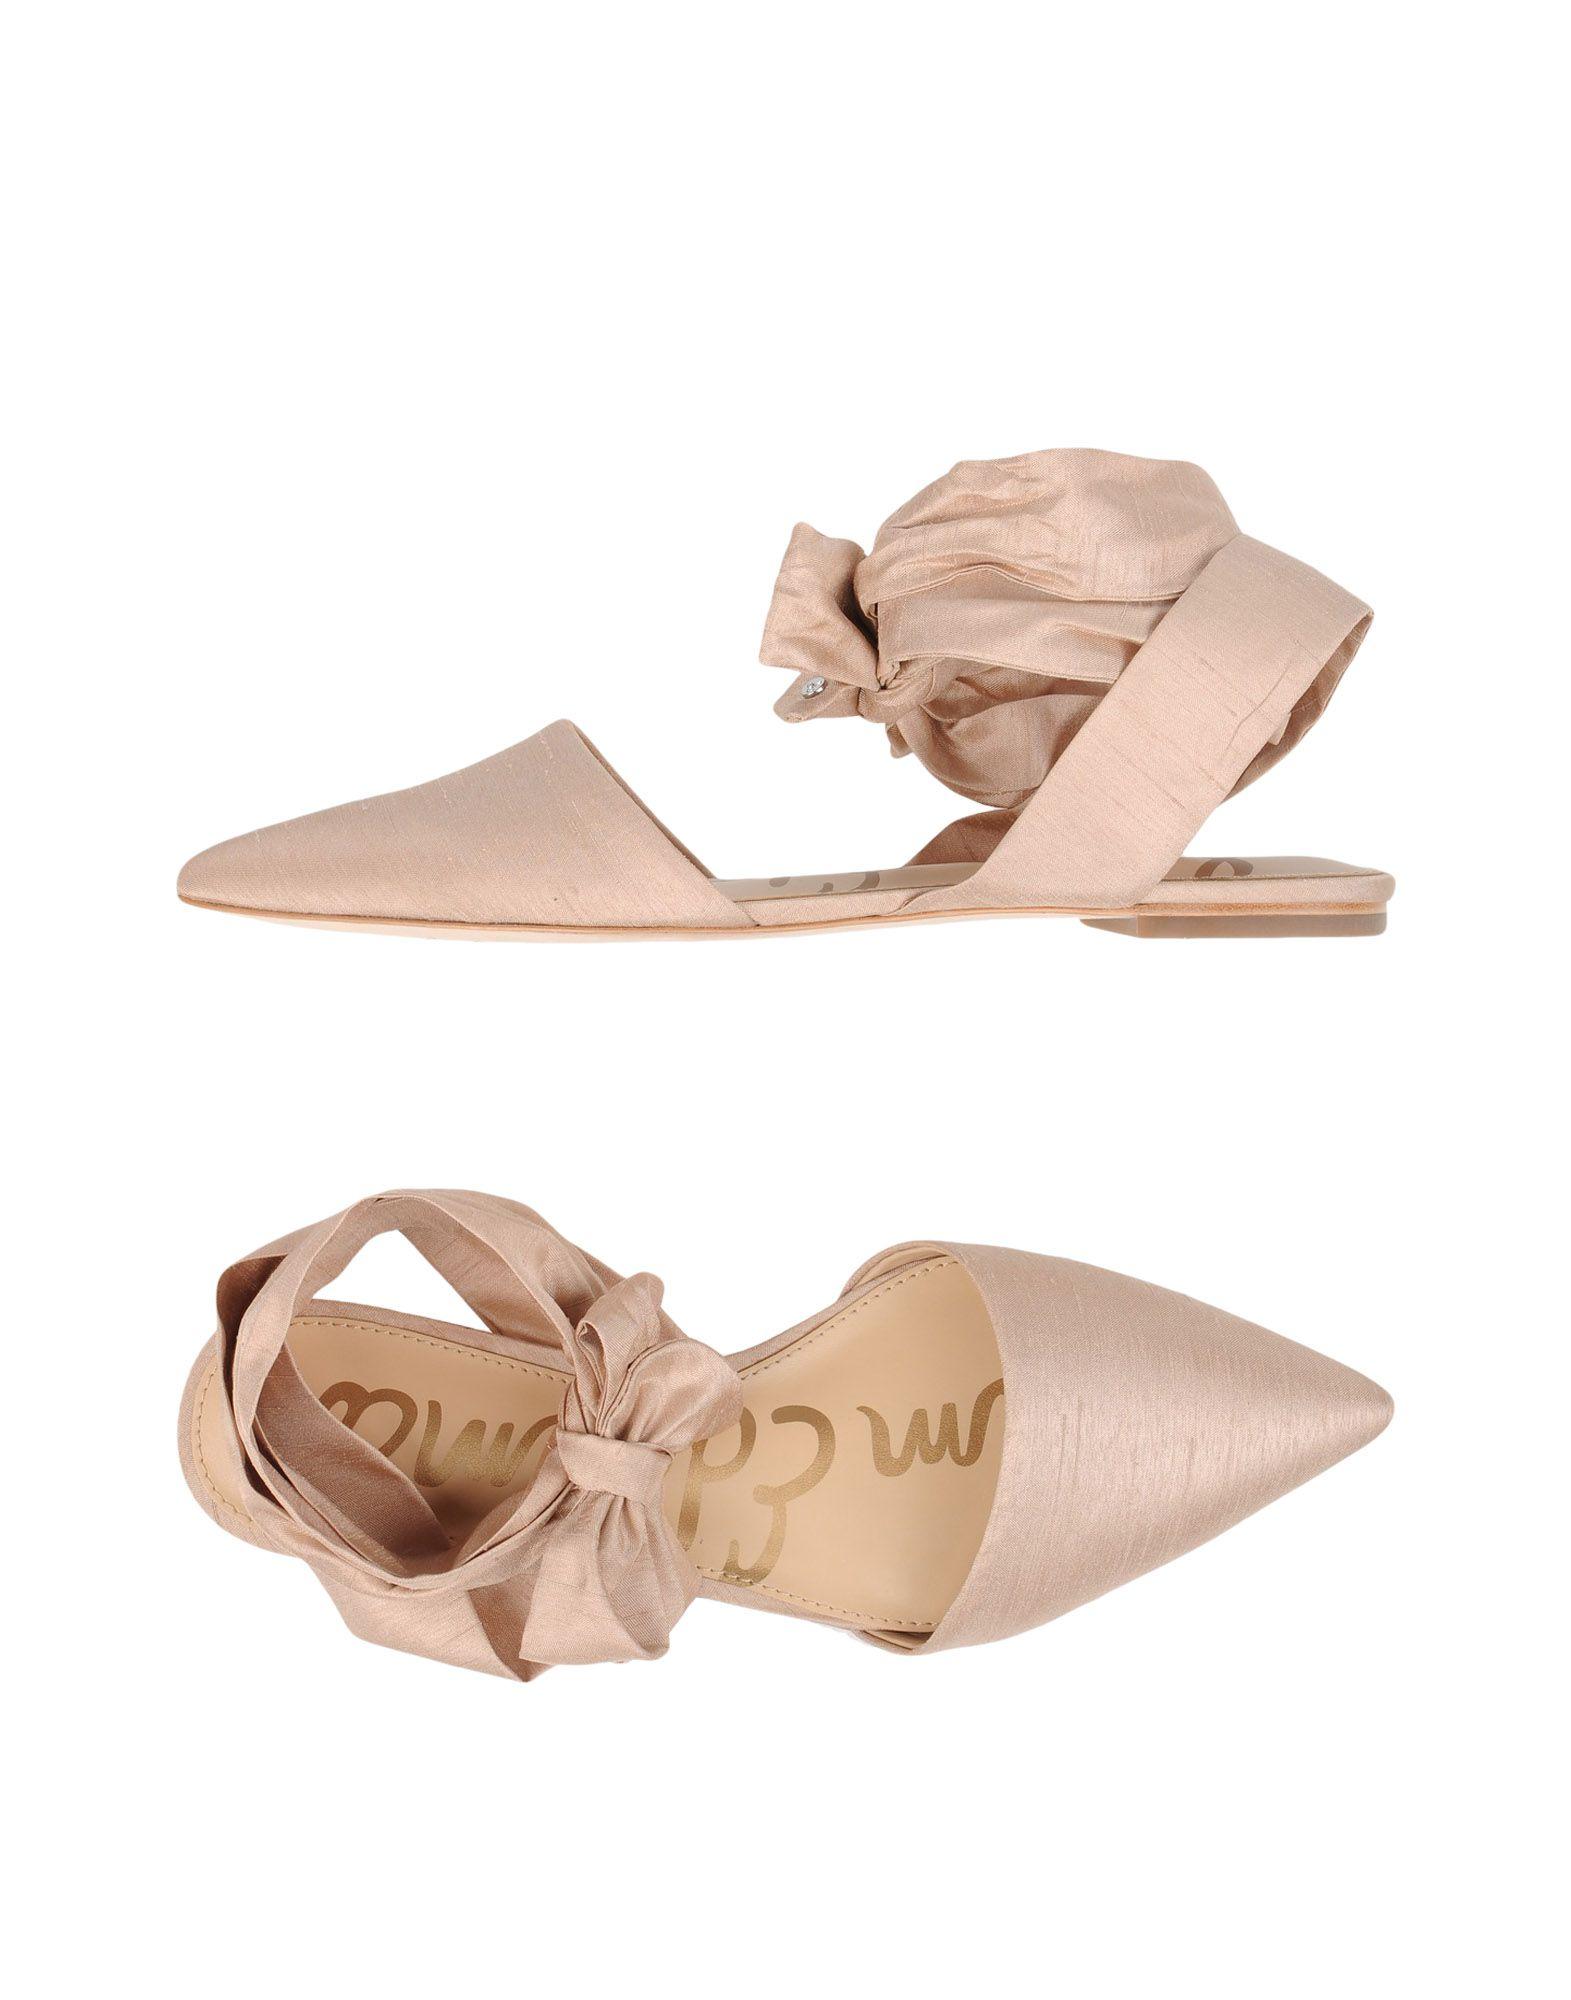 Sam Edelman Sandalen Damen  11339751XU Gute Qualität beliebte Schuhe